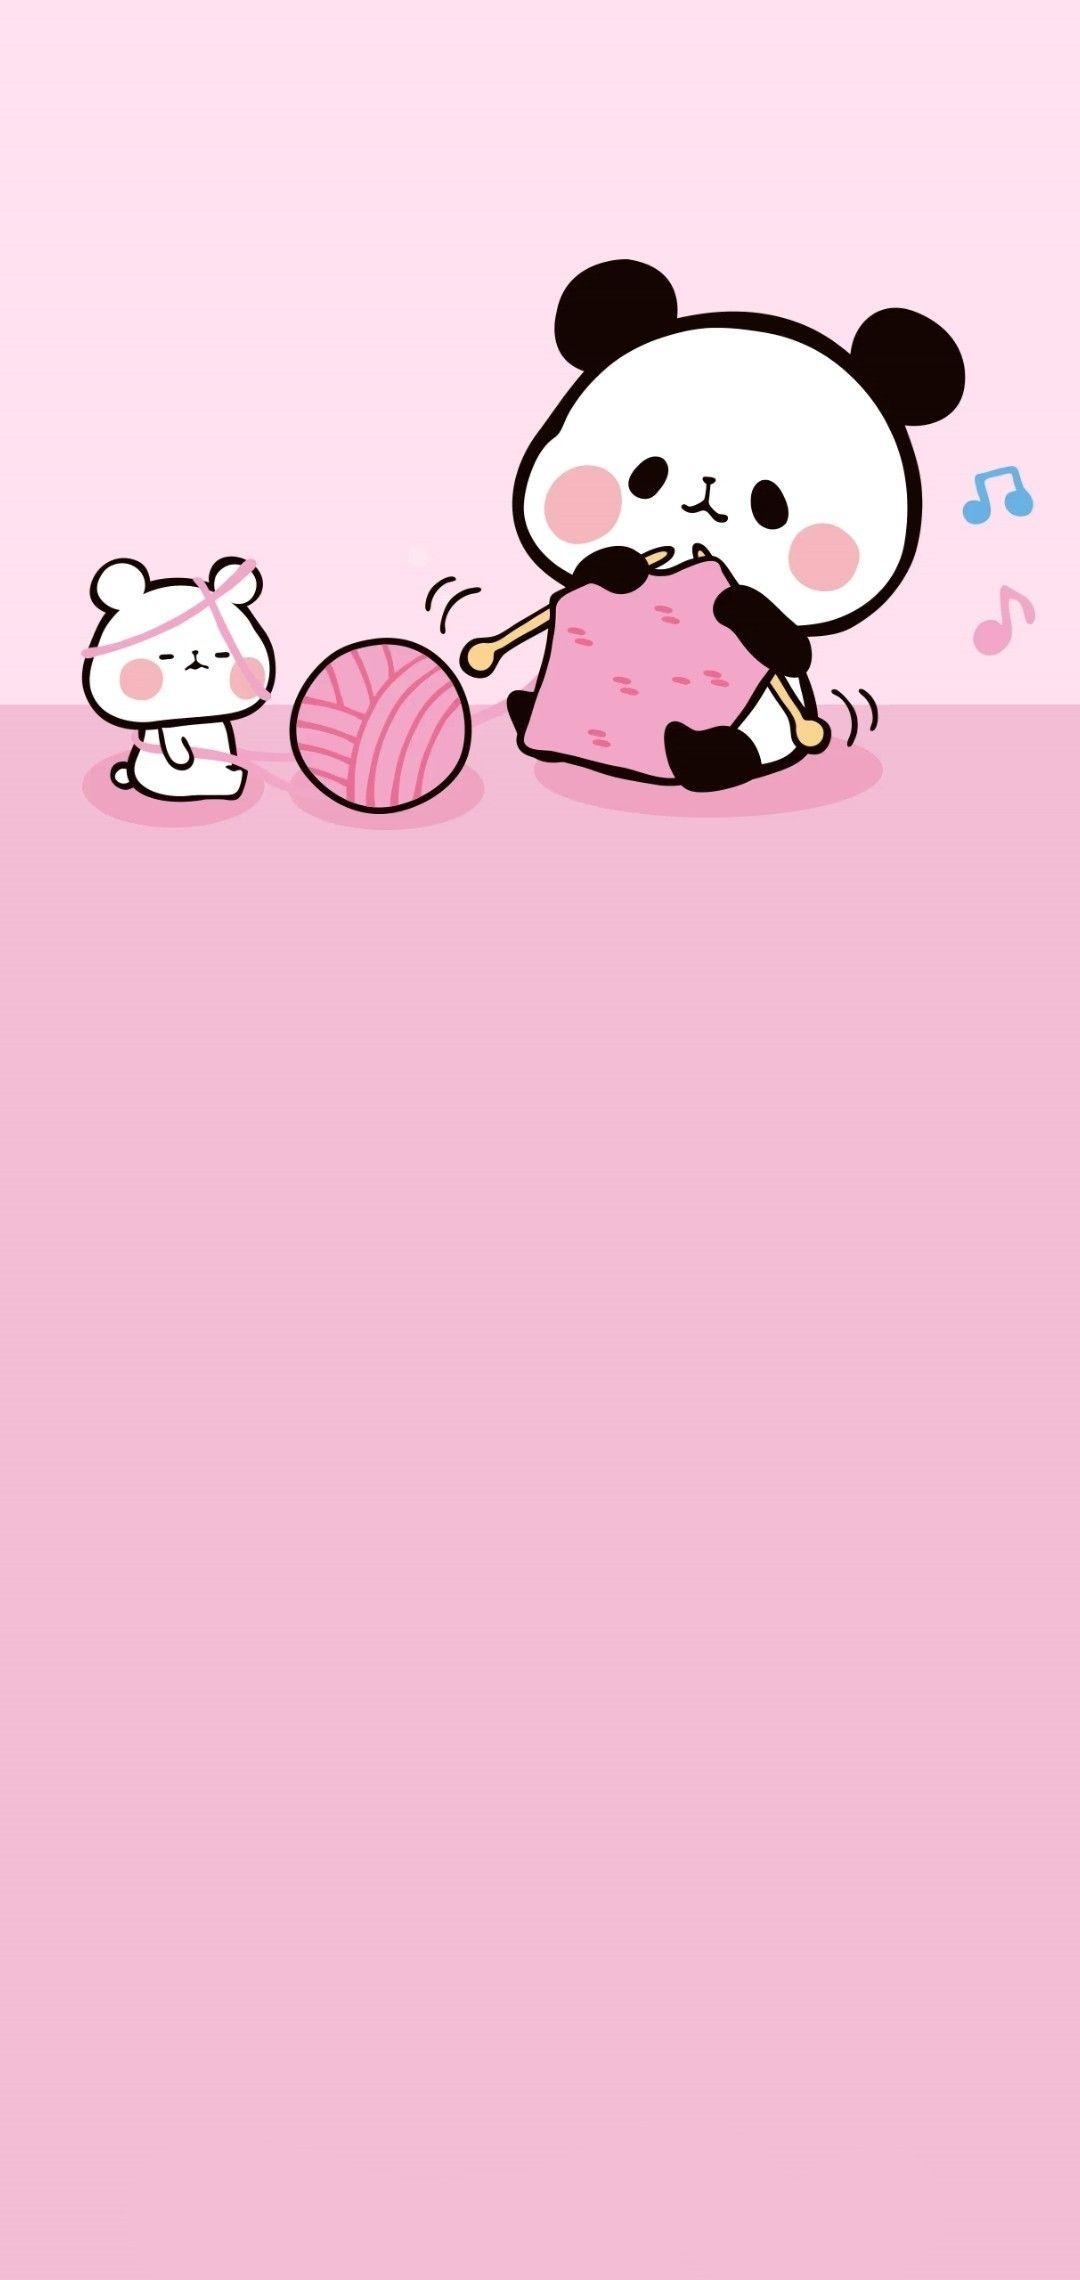 Pin Oleh Patty Silva Di Pink Backgrounds Ilustrasi Karakter Gambar Lucu Ilustrasi Cute pink panda wallpaper for cellphone